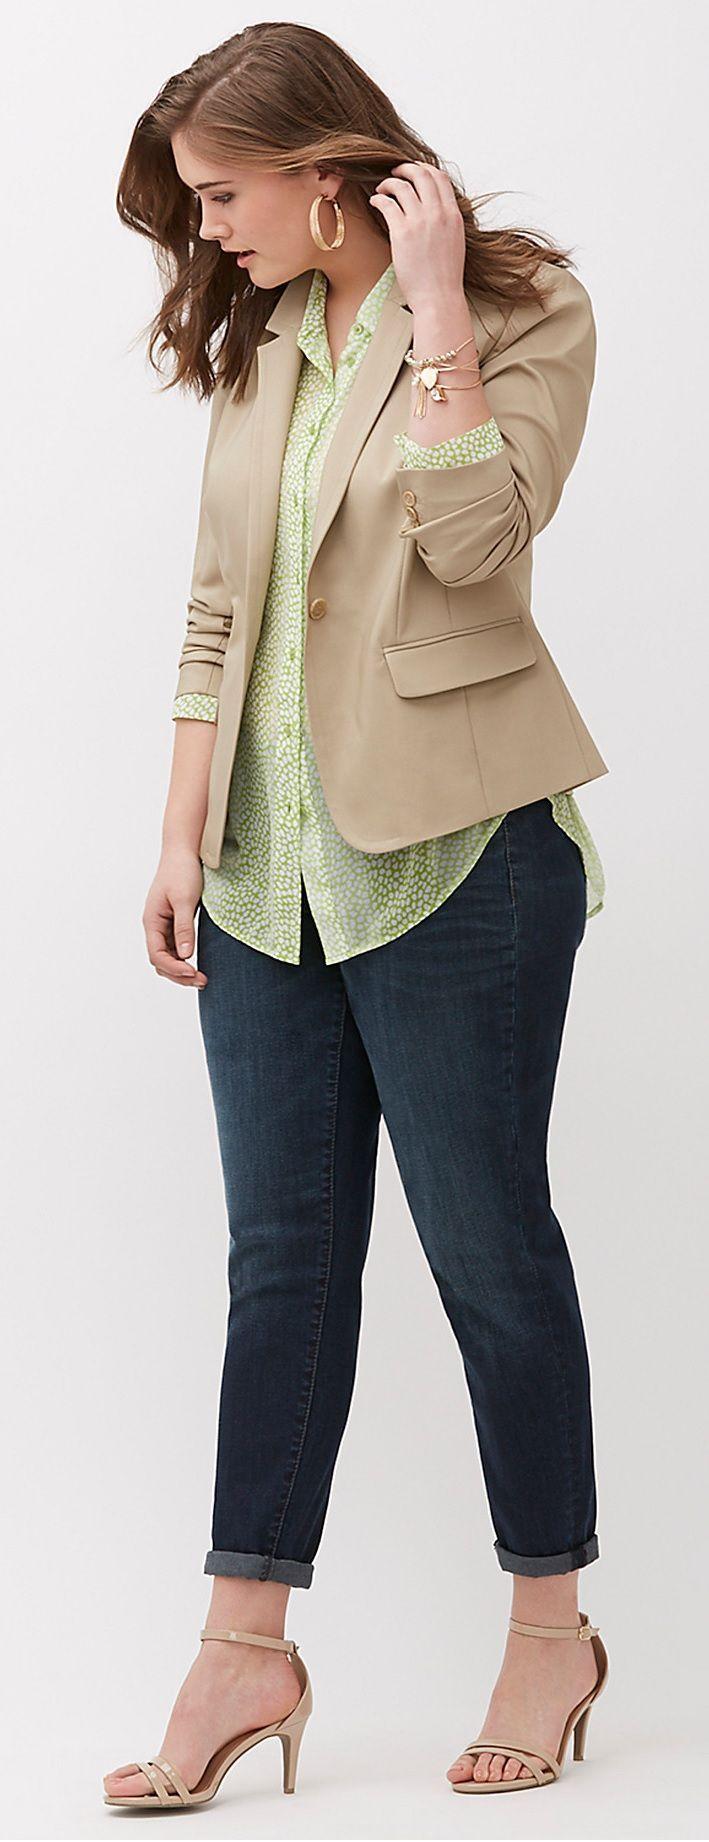 awesome Lane Bryant - Lane Bryant The Modernist Suit Jacket by http://www.globalfashionista.xyz/plus-size-fashion/lane-bryant-lane-bryant-the-modernist-suit-jacket/